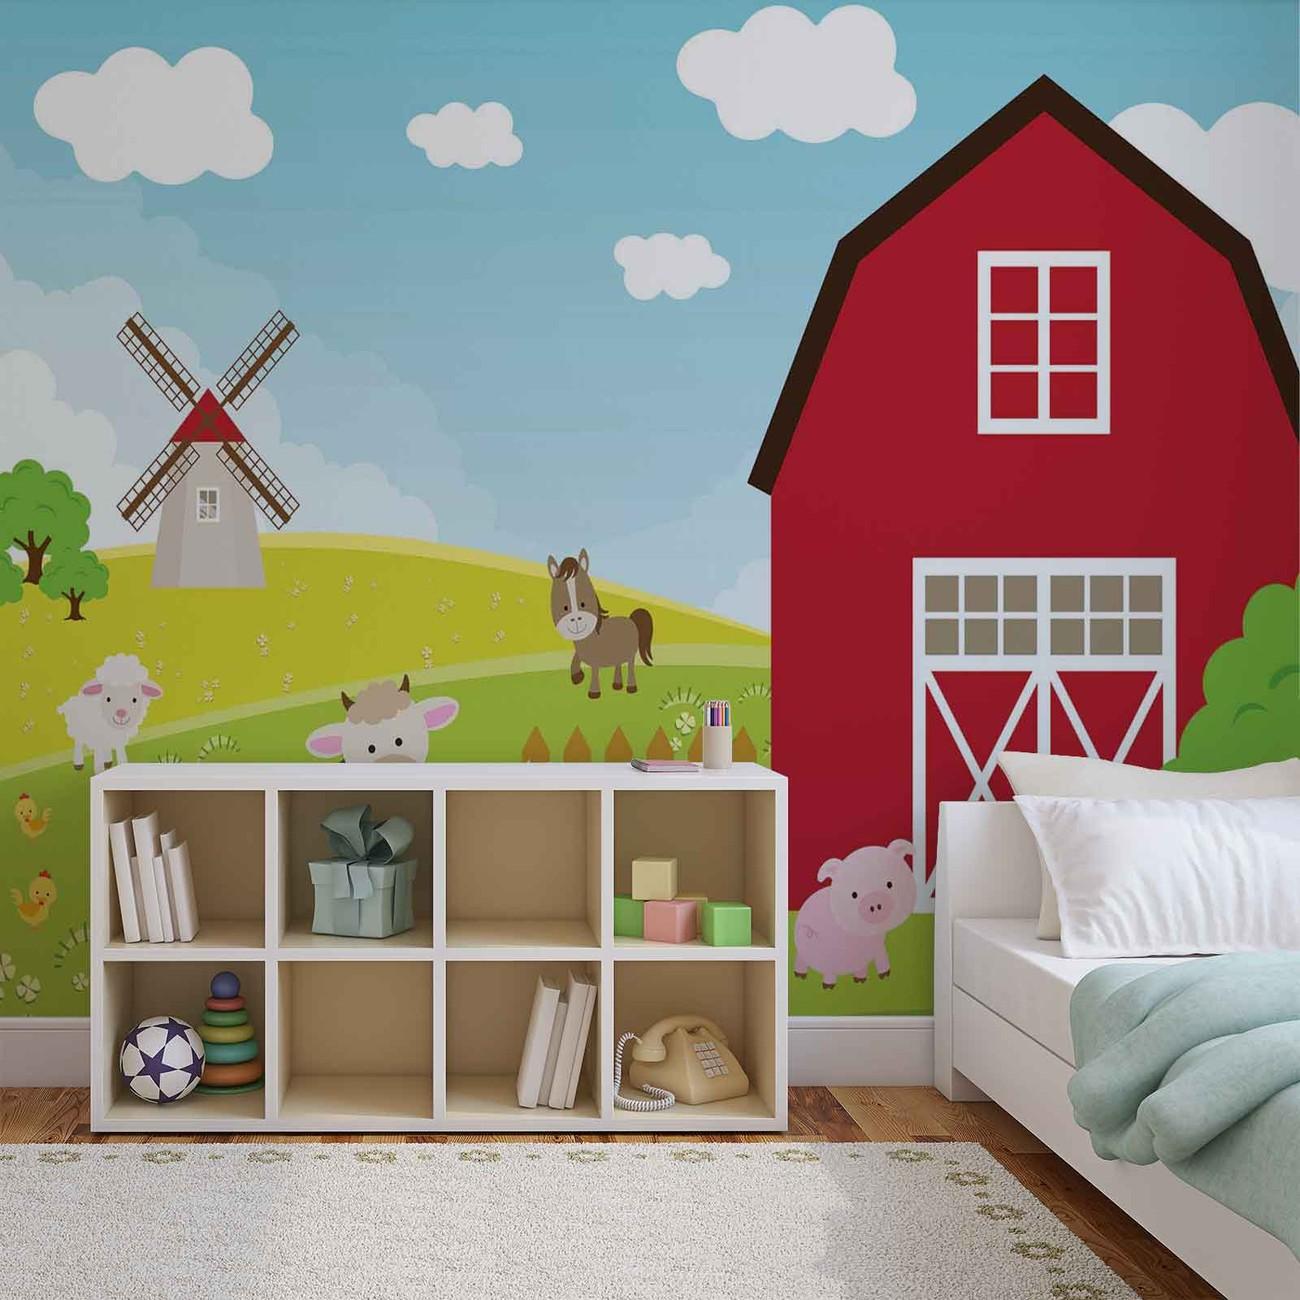 farm cartoon boys bedroom wall paper mural buy at. Black Bedroom Furniture Sets. Home Design Ideas